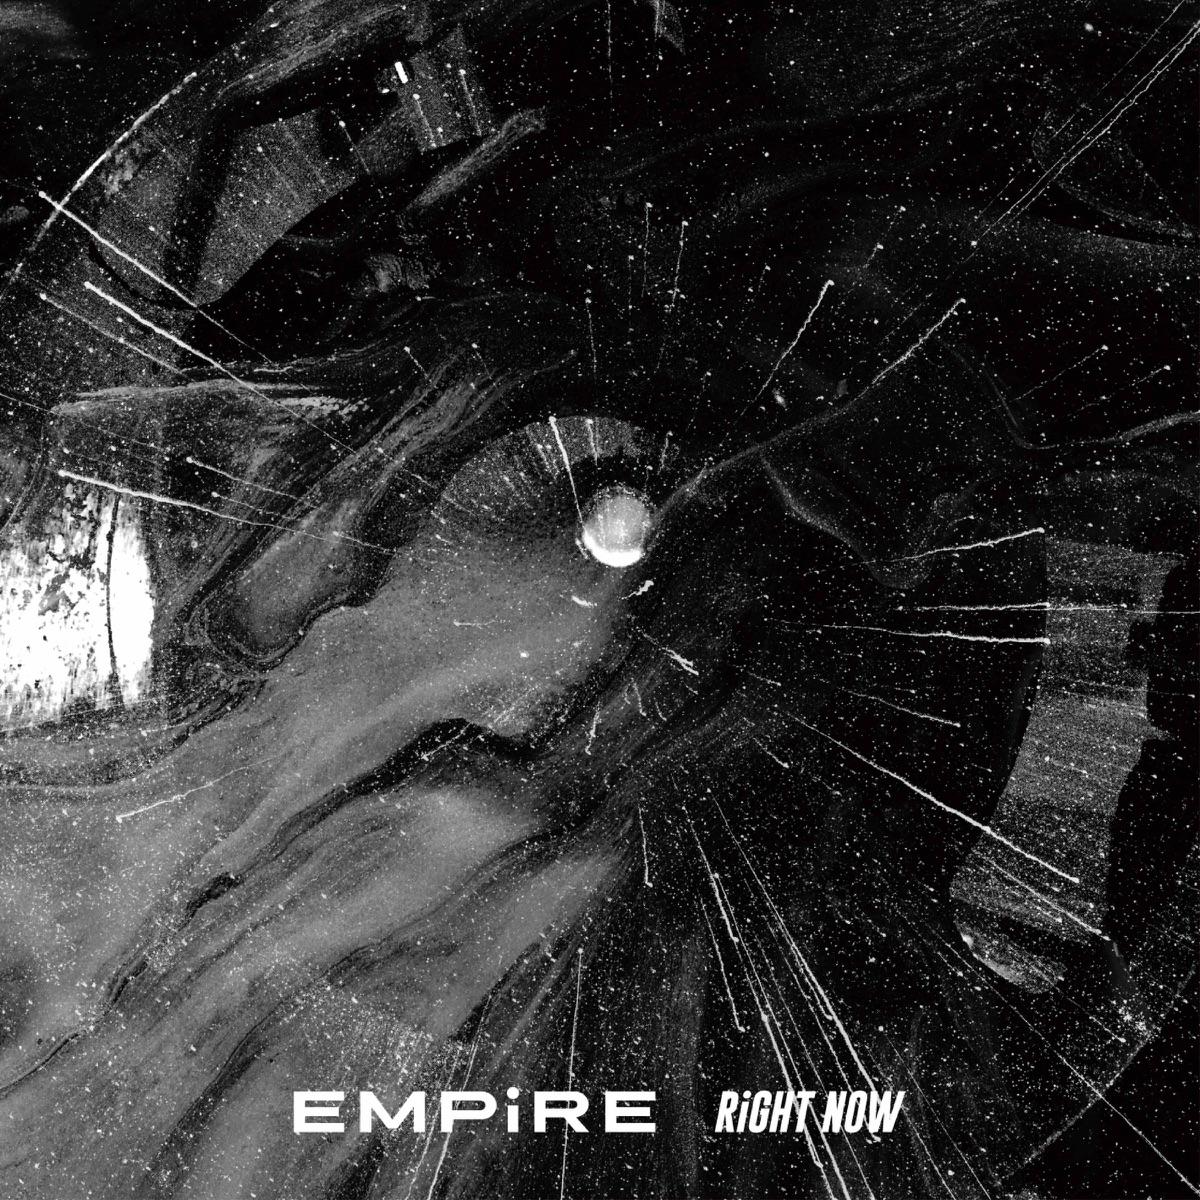 『EMPiRE - RiGHT NOW』収録の『RiGHT NOW』ジャケット